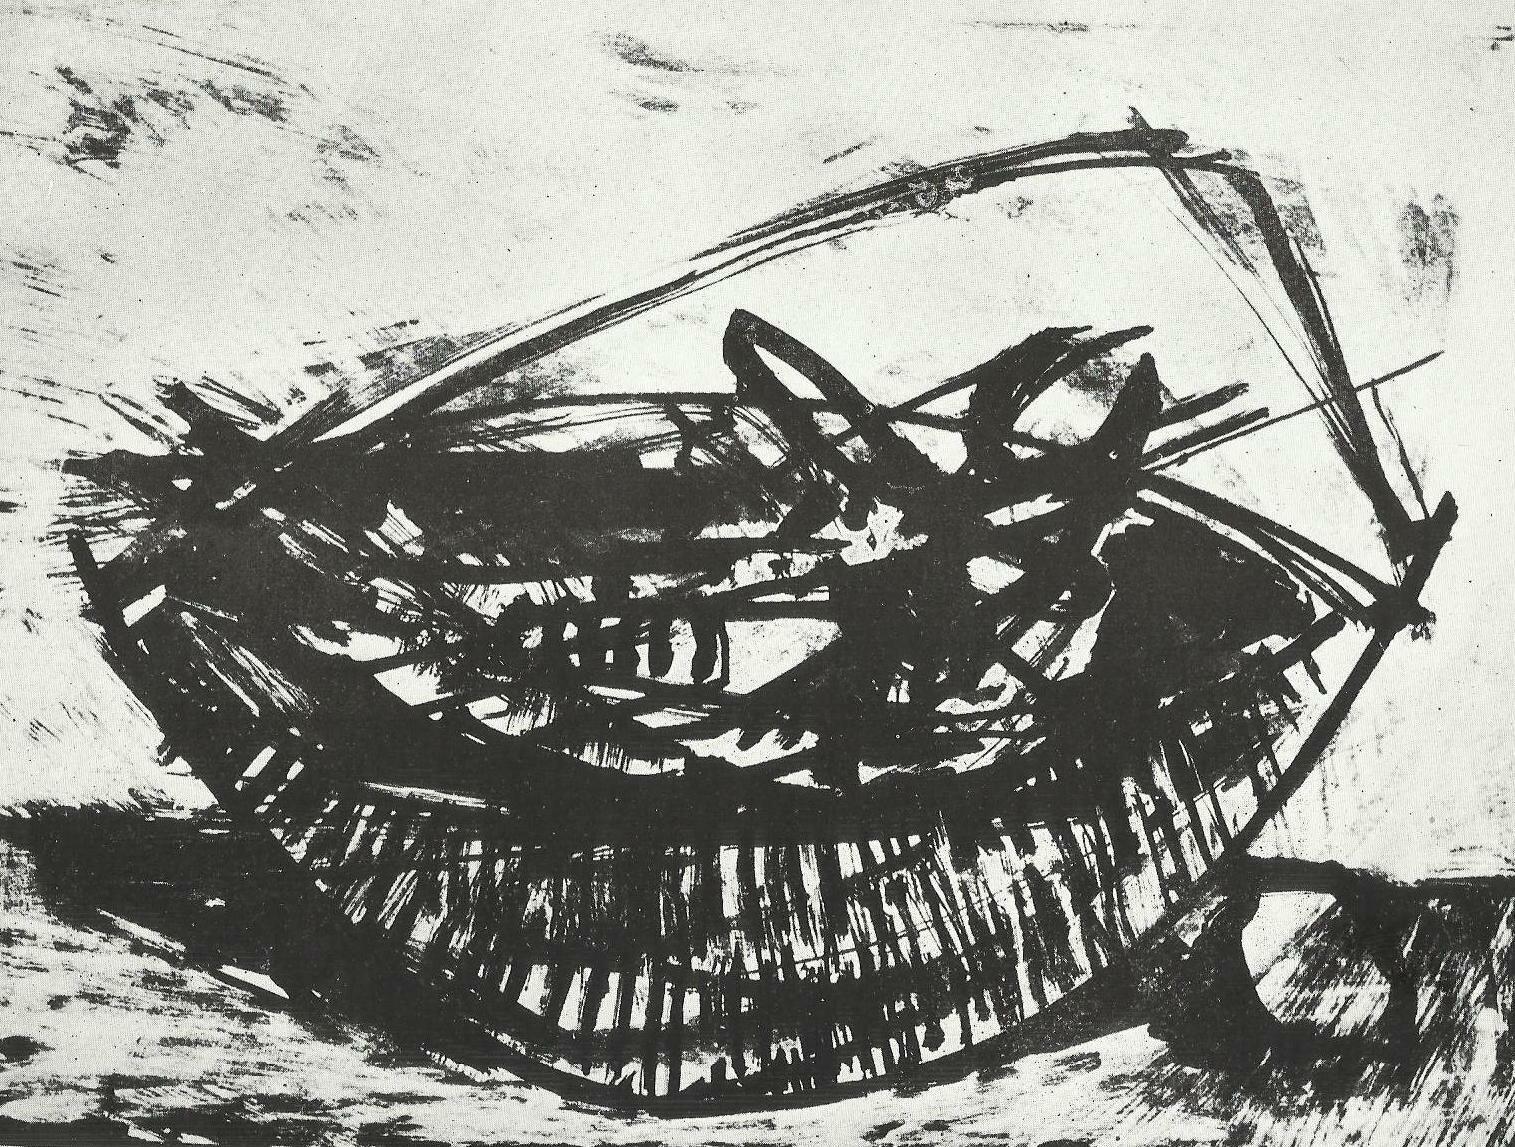 Ribarska korpa, litografija (1964)